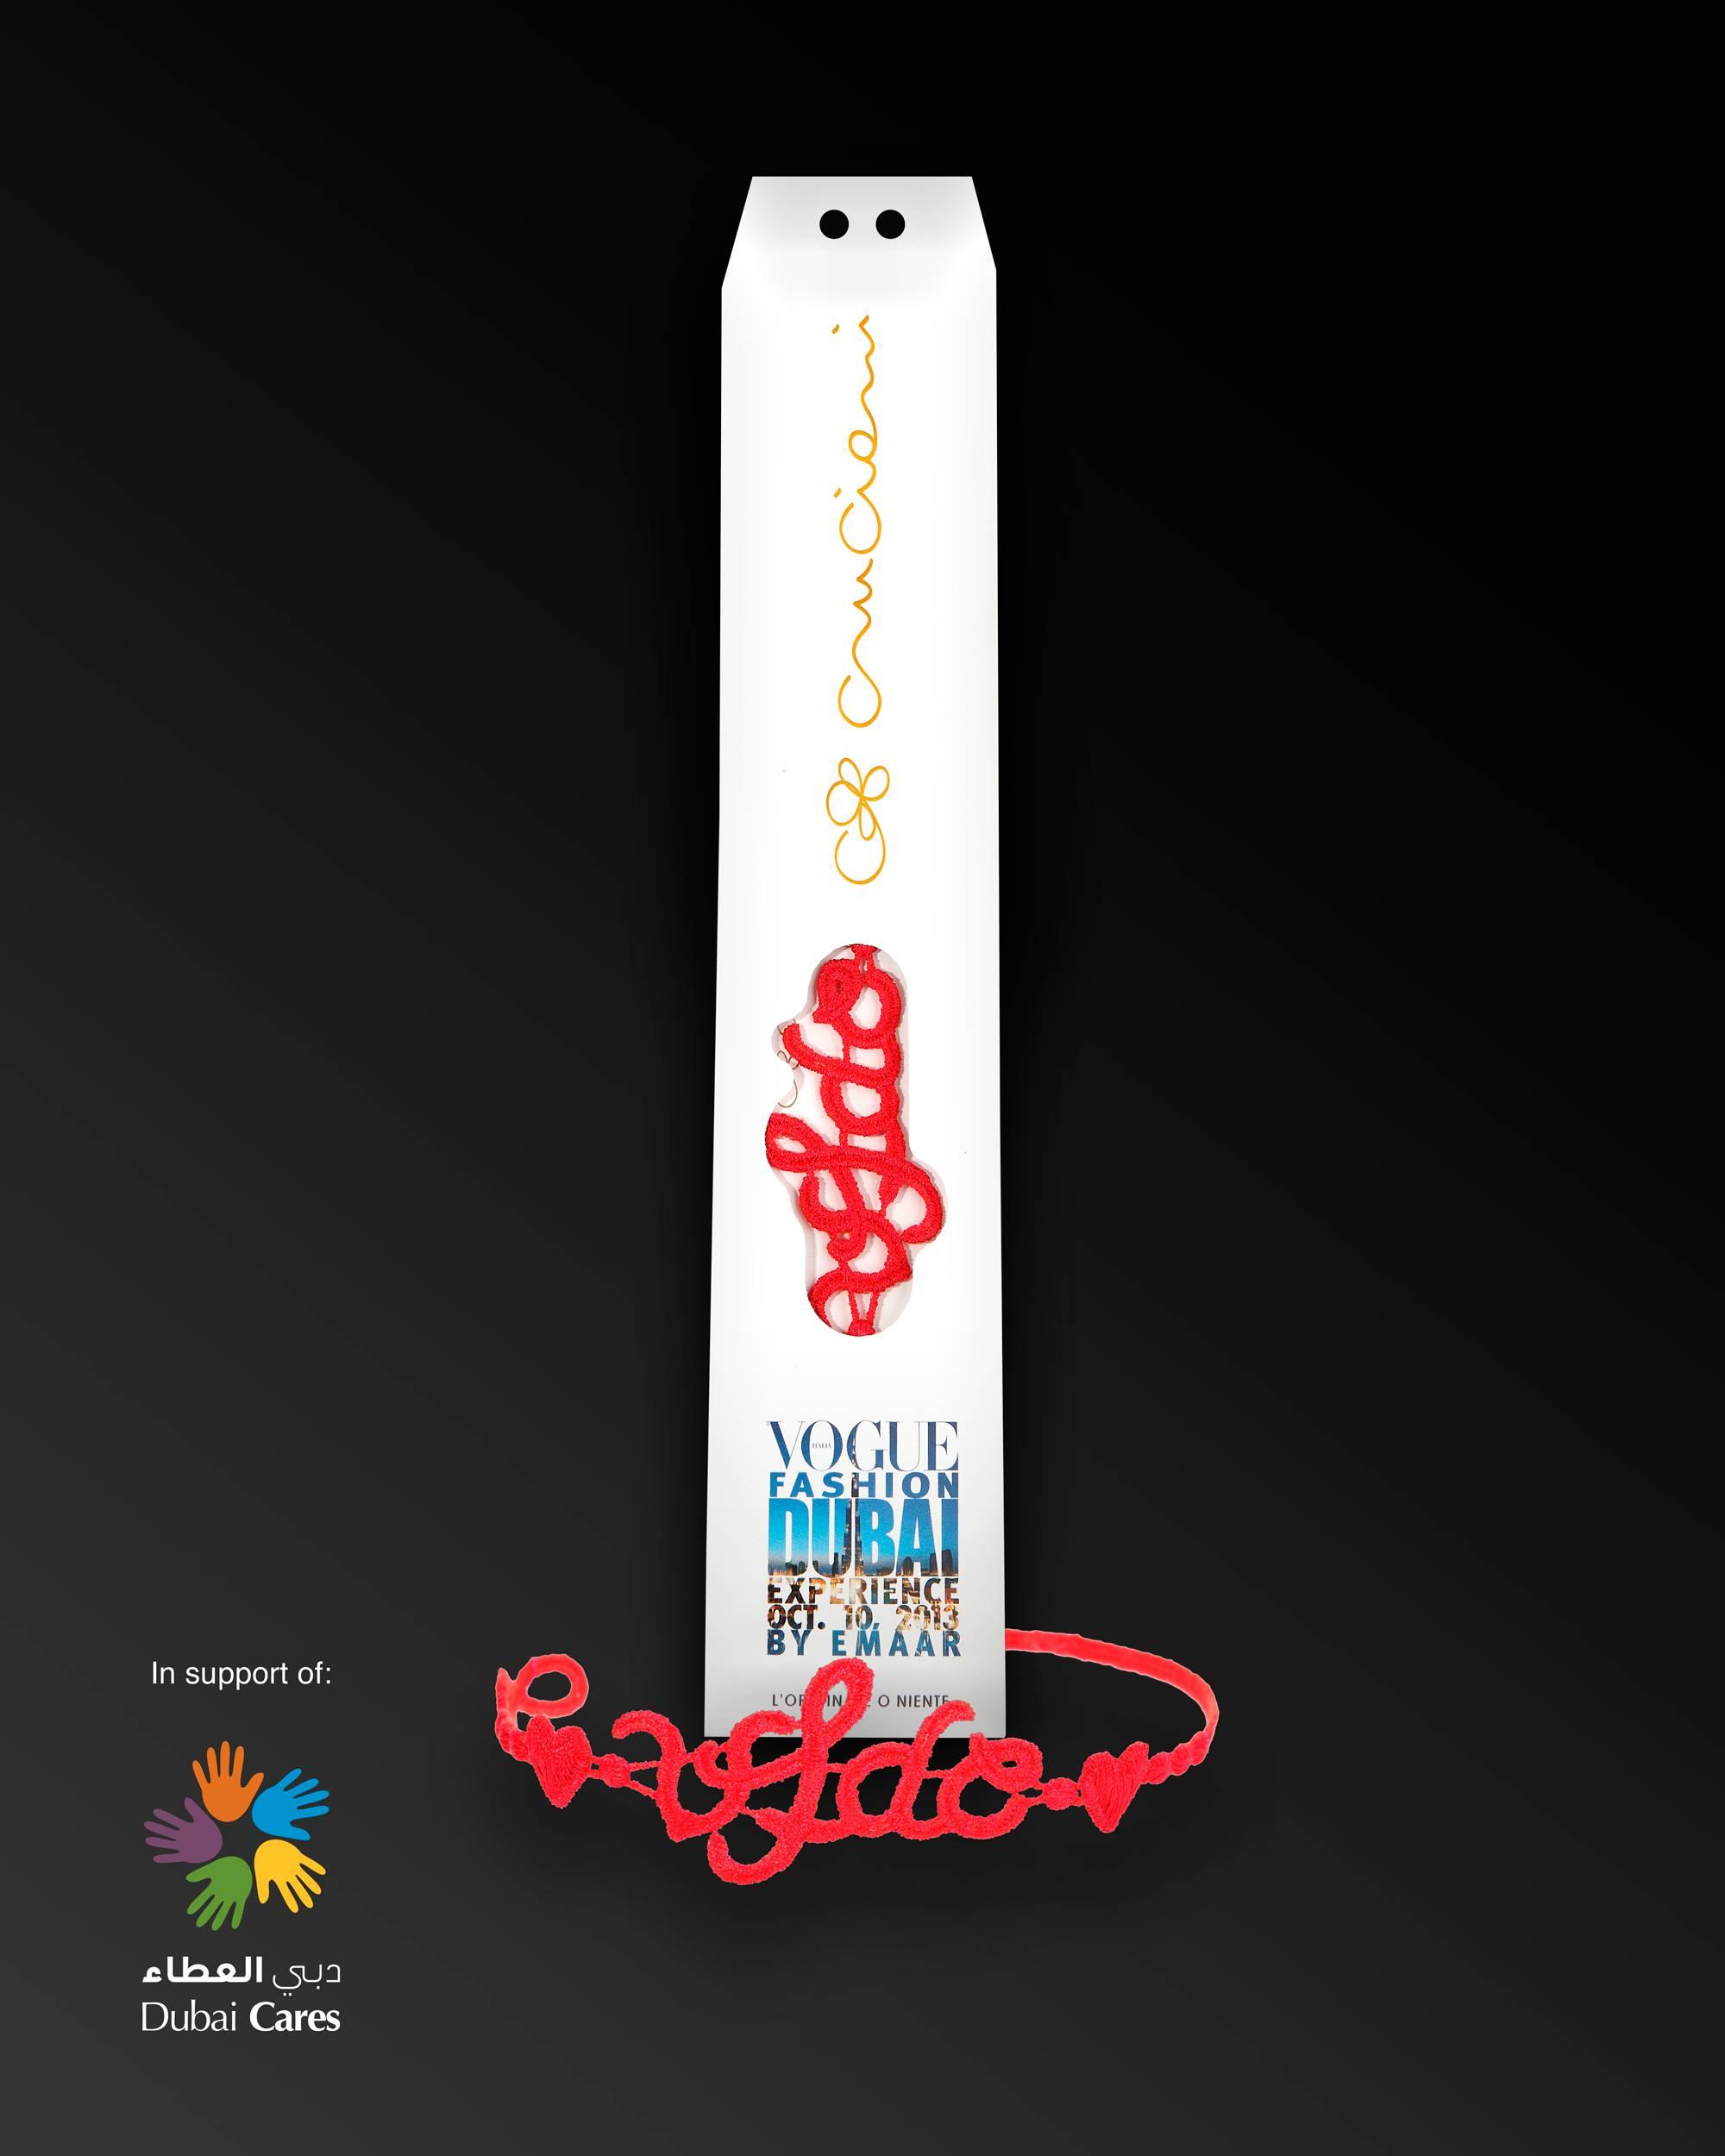 Cruciani C – Vogue Fashion Dubai Experience bracelet